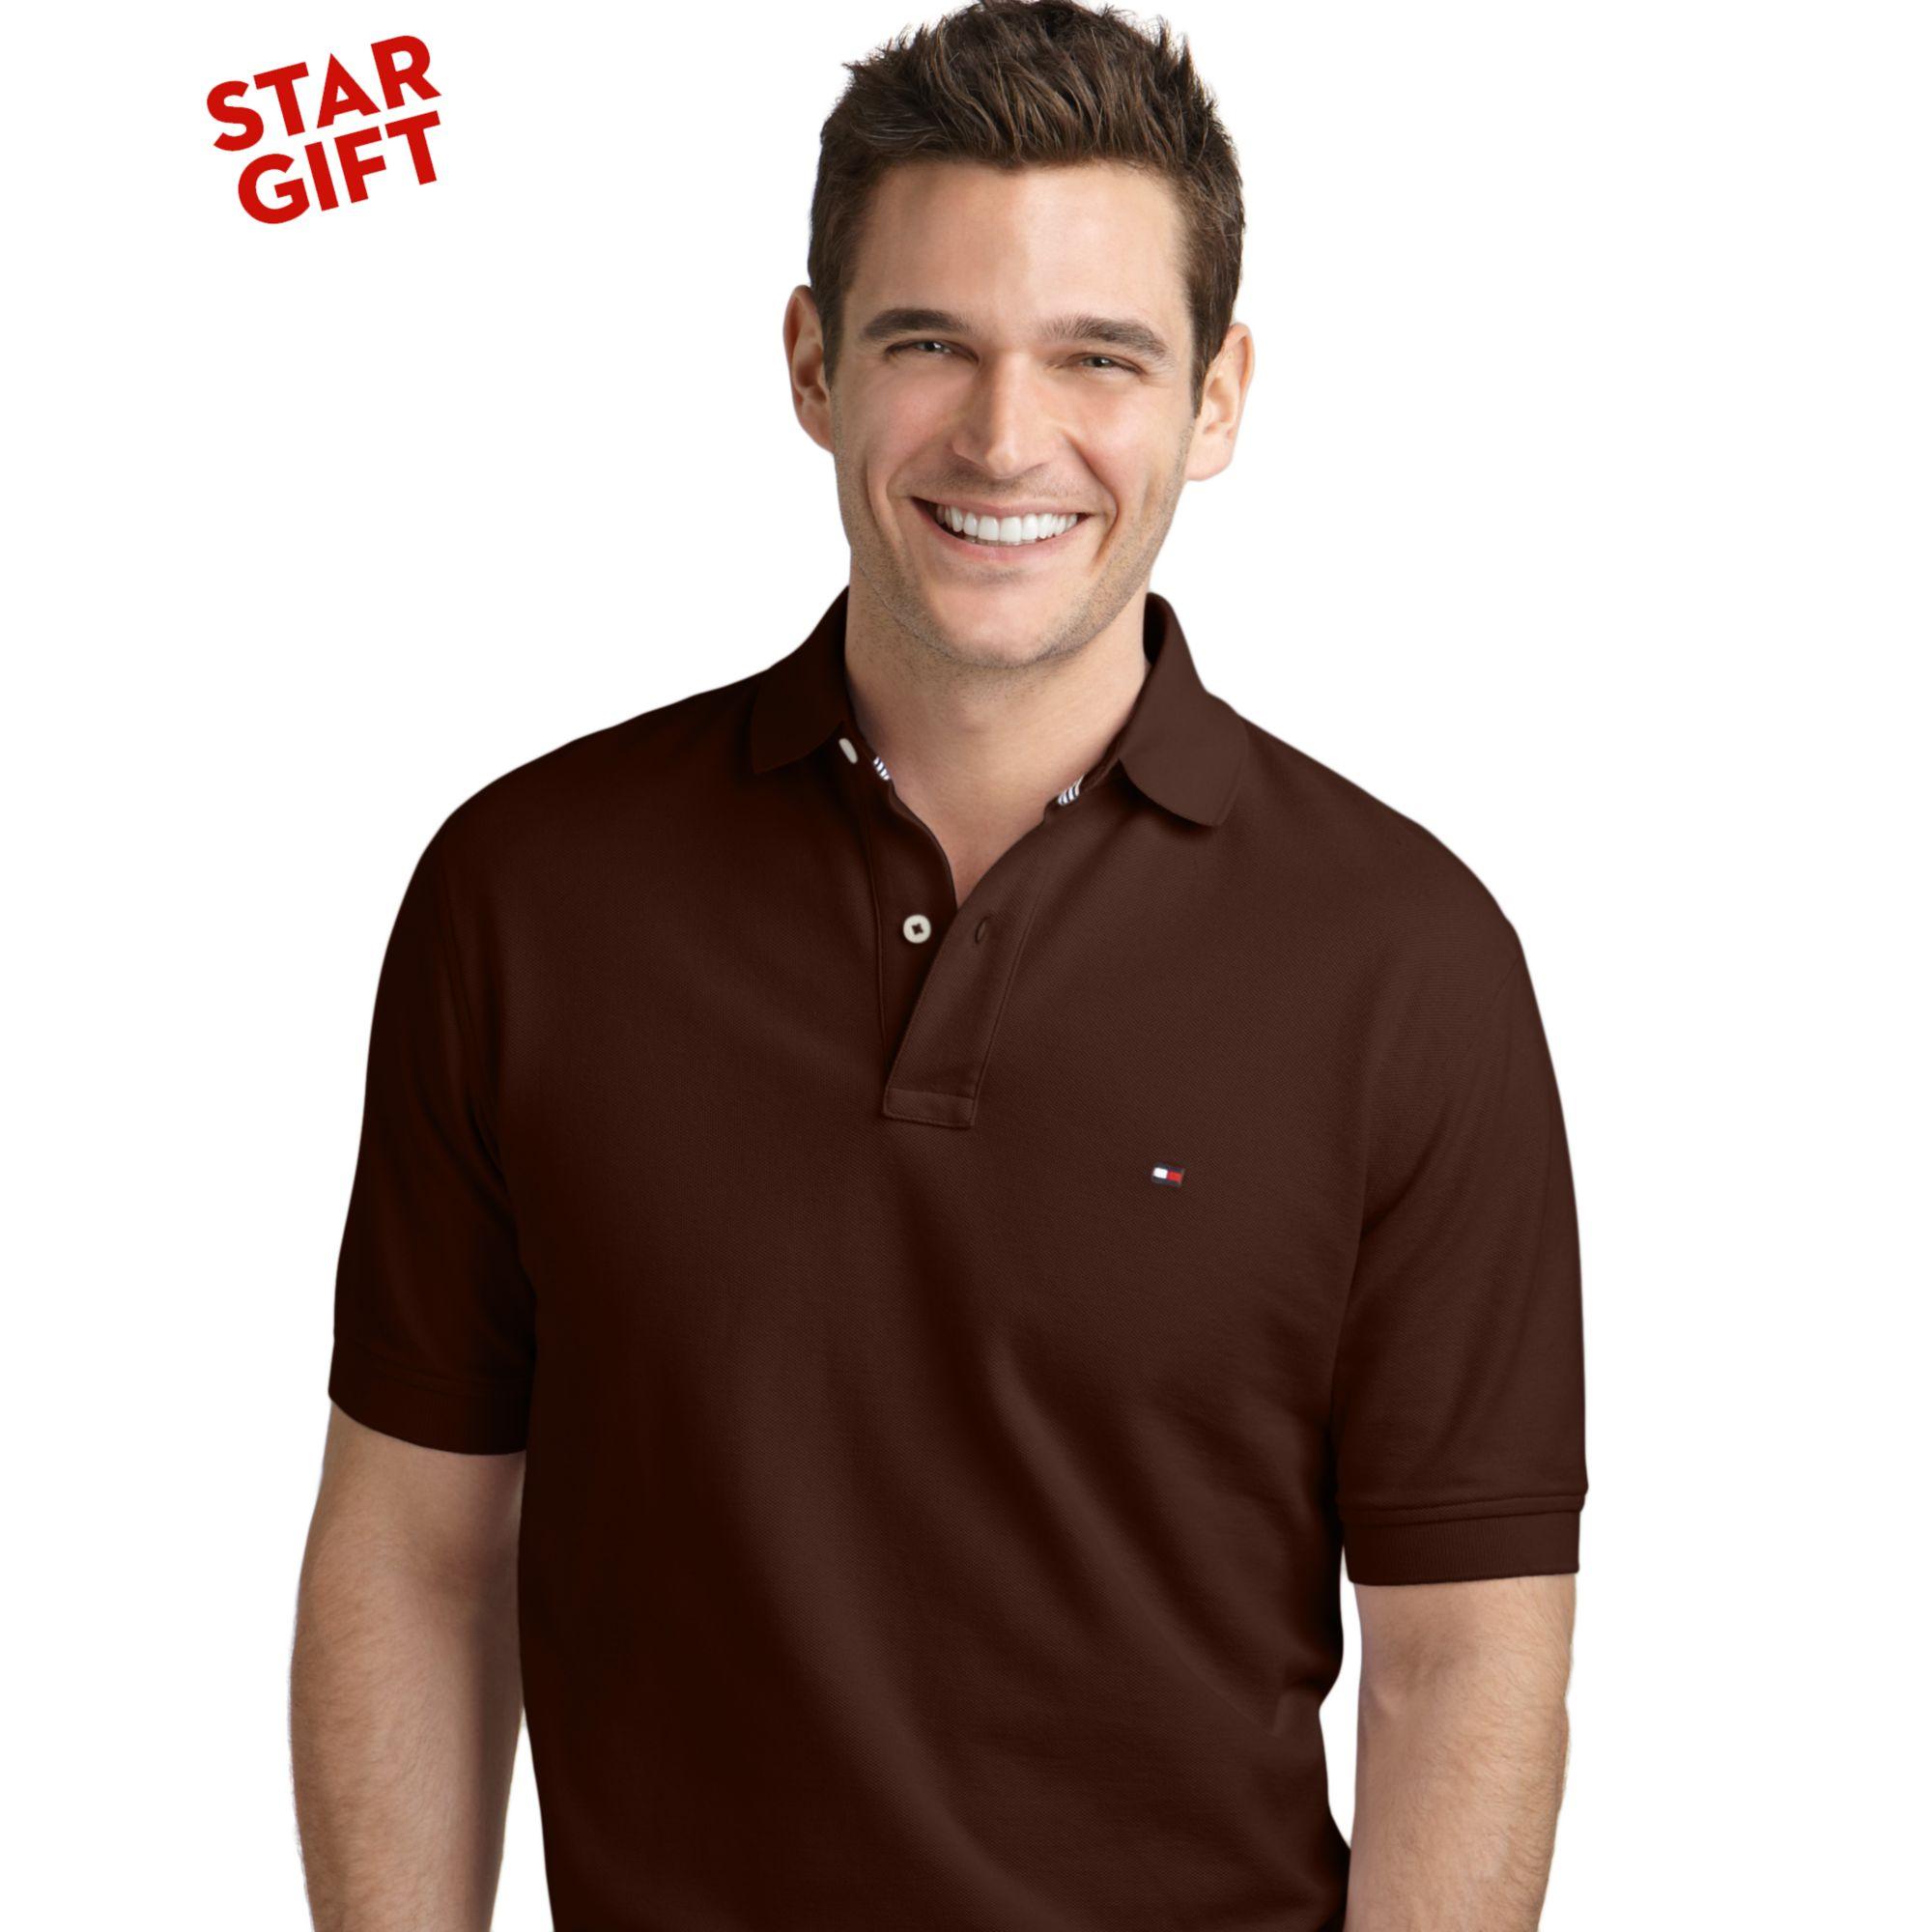 lyst tommy hilfiger ivy polo shirt in brown for men. Black Bedroom Furniture Sets. Home Design Ideas